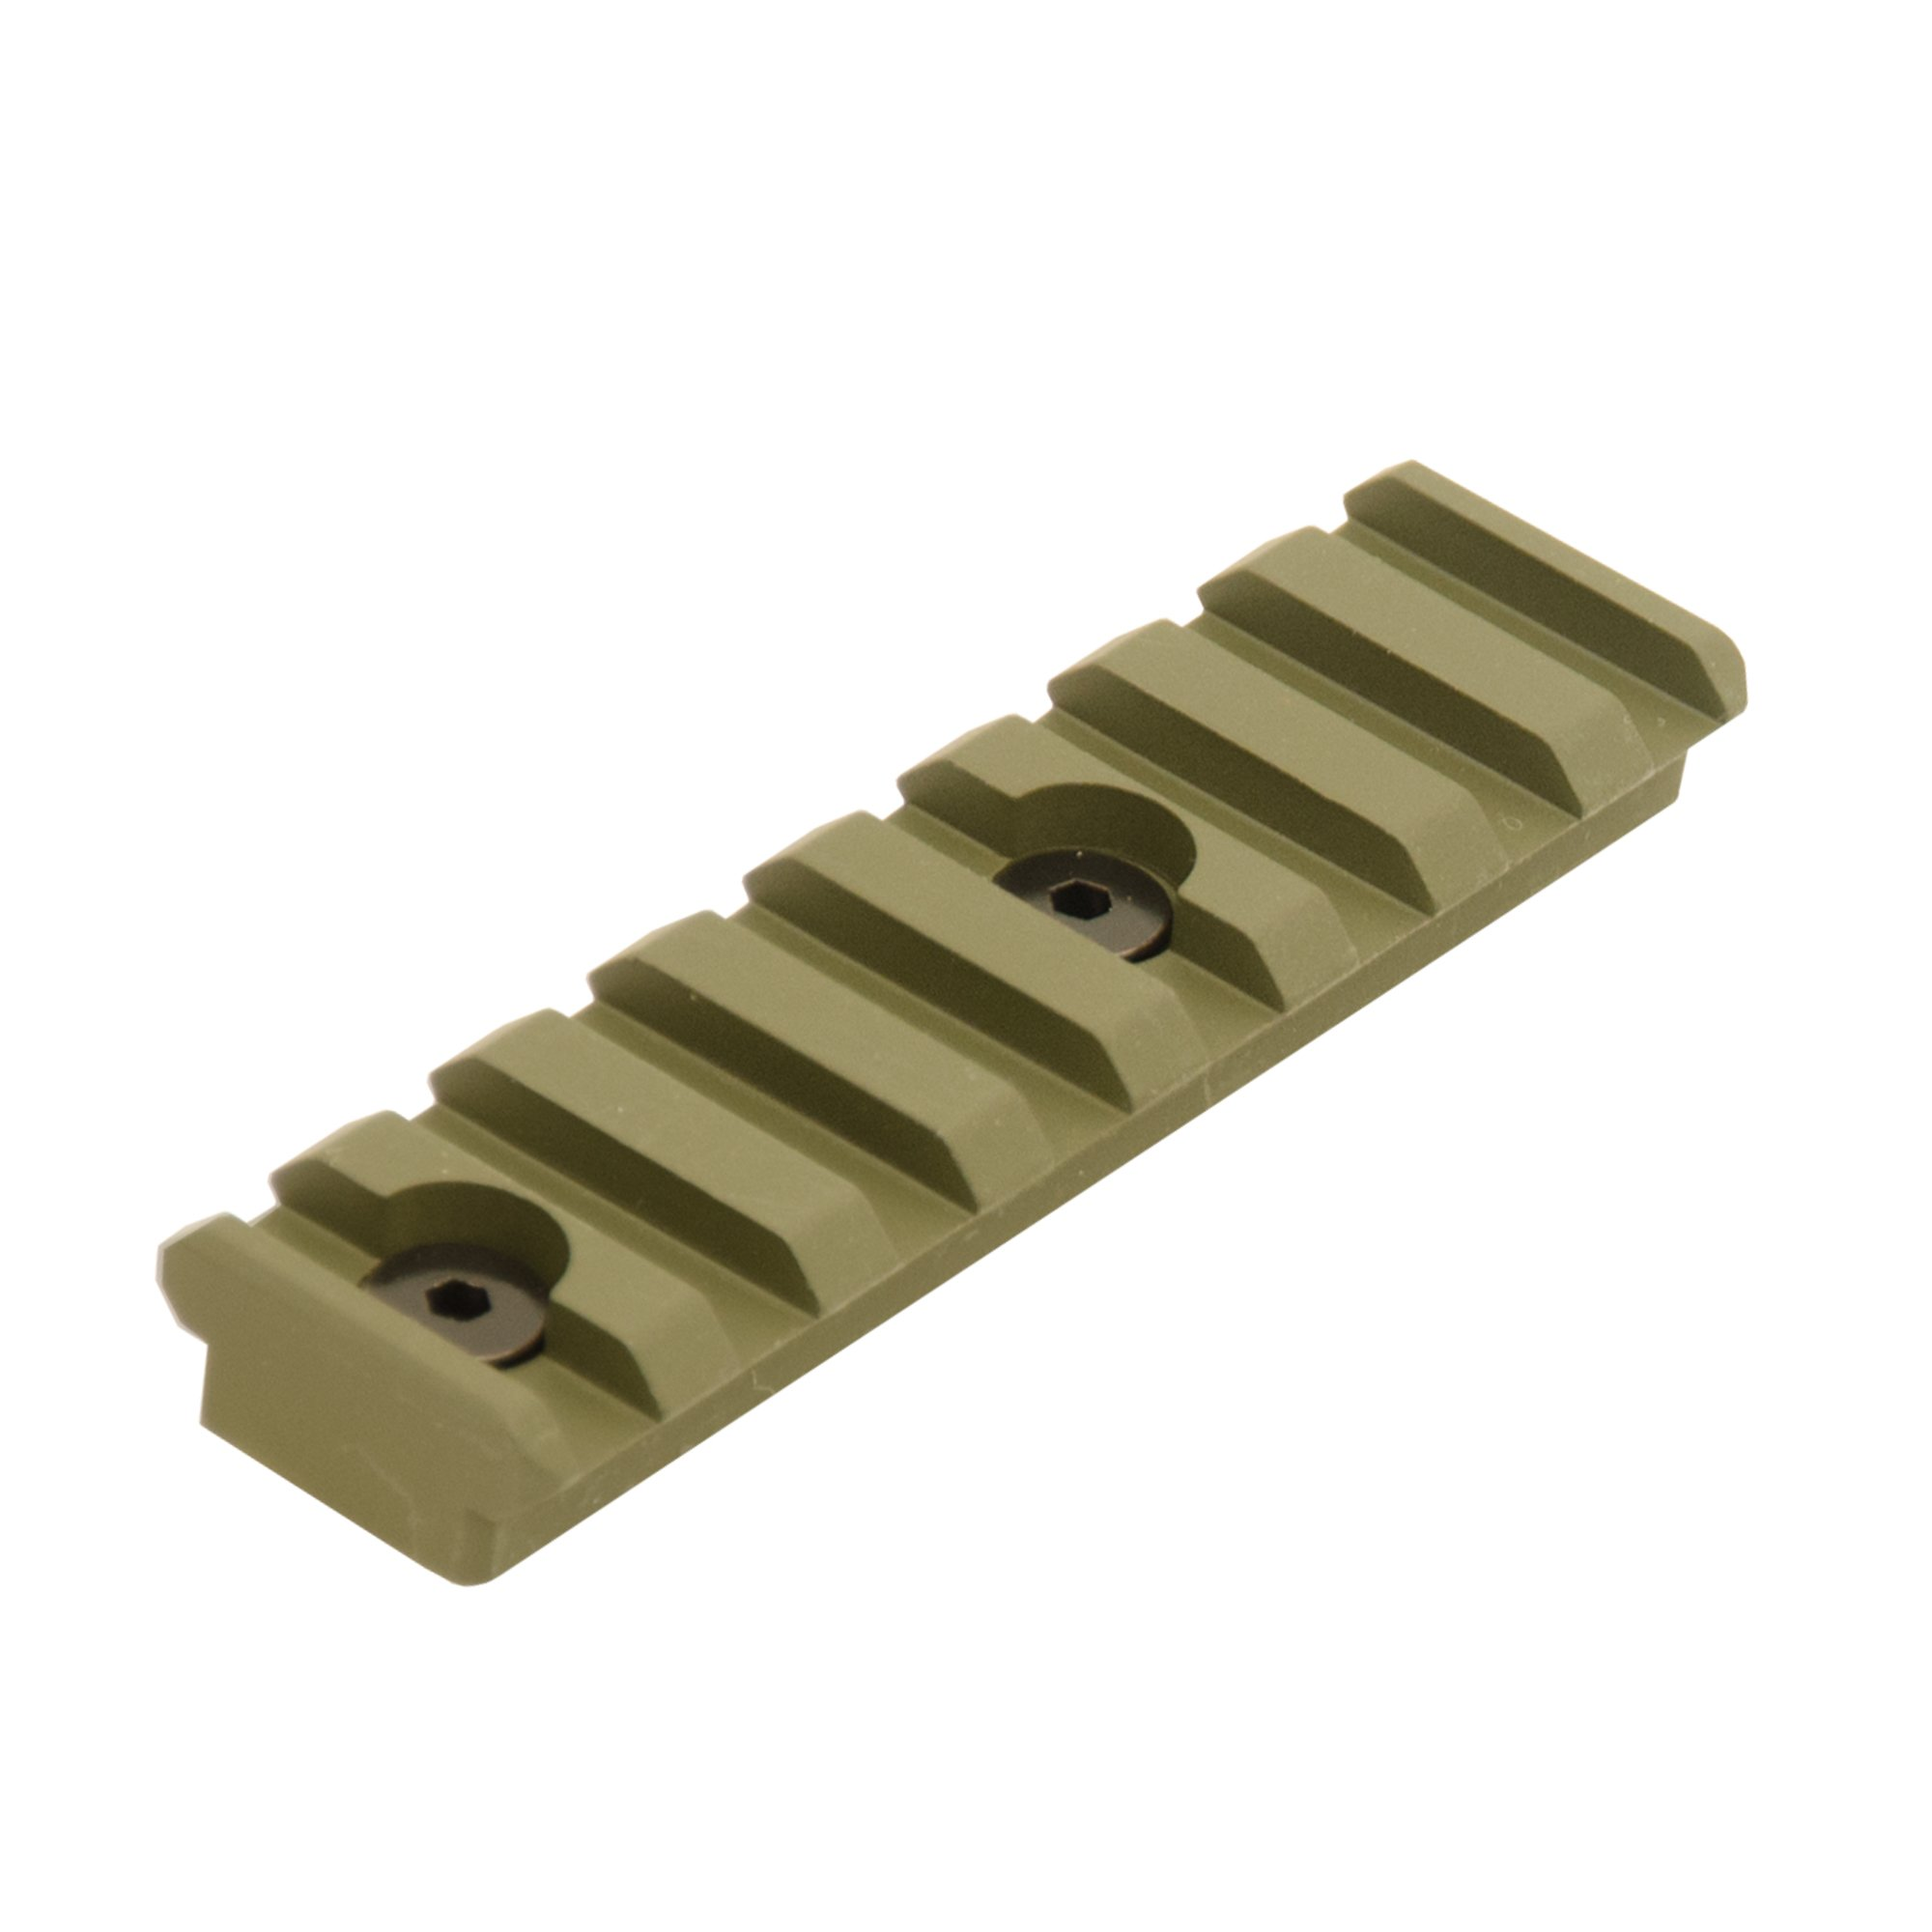 UTG PRO 8-Slot Keymod Picatinny Rail Section-OD Green